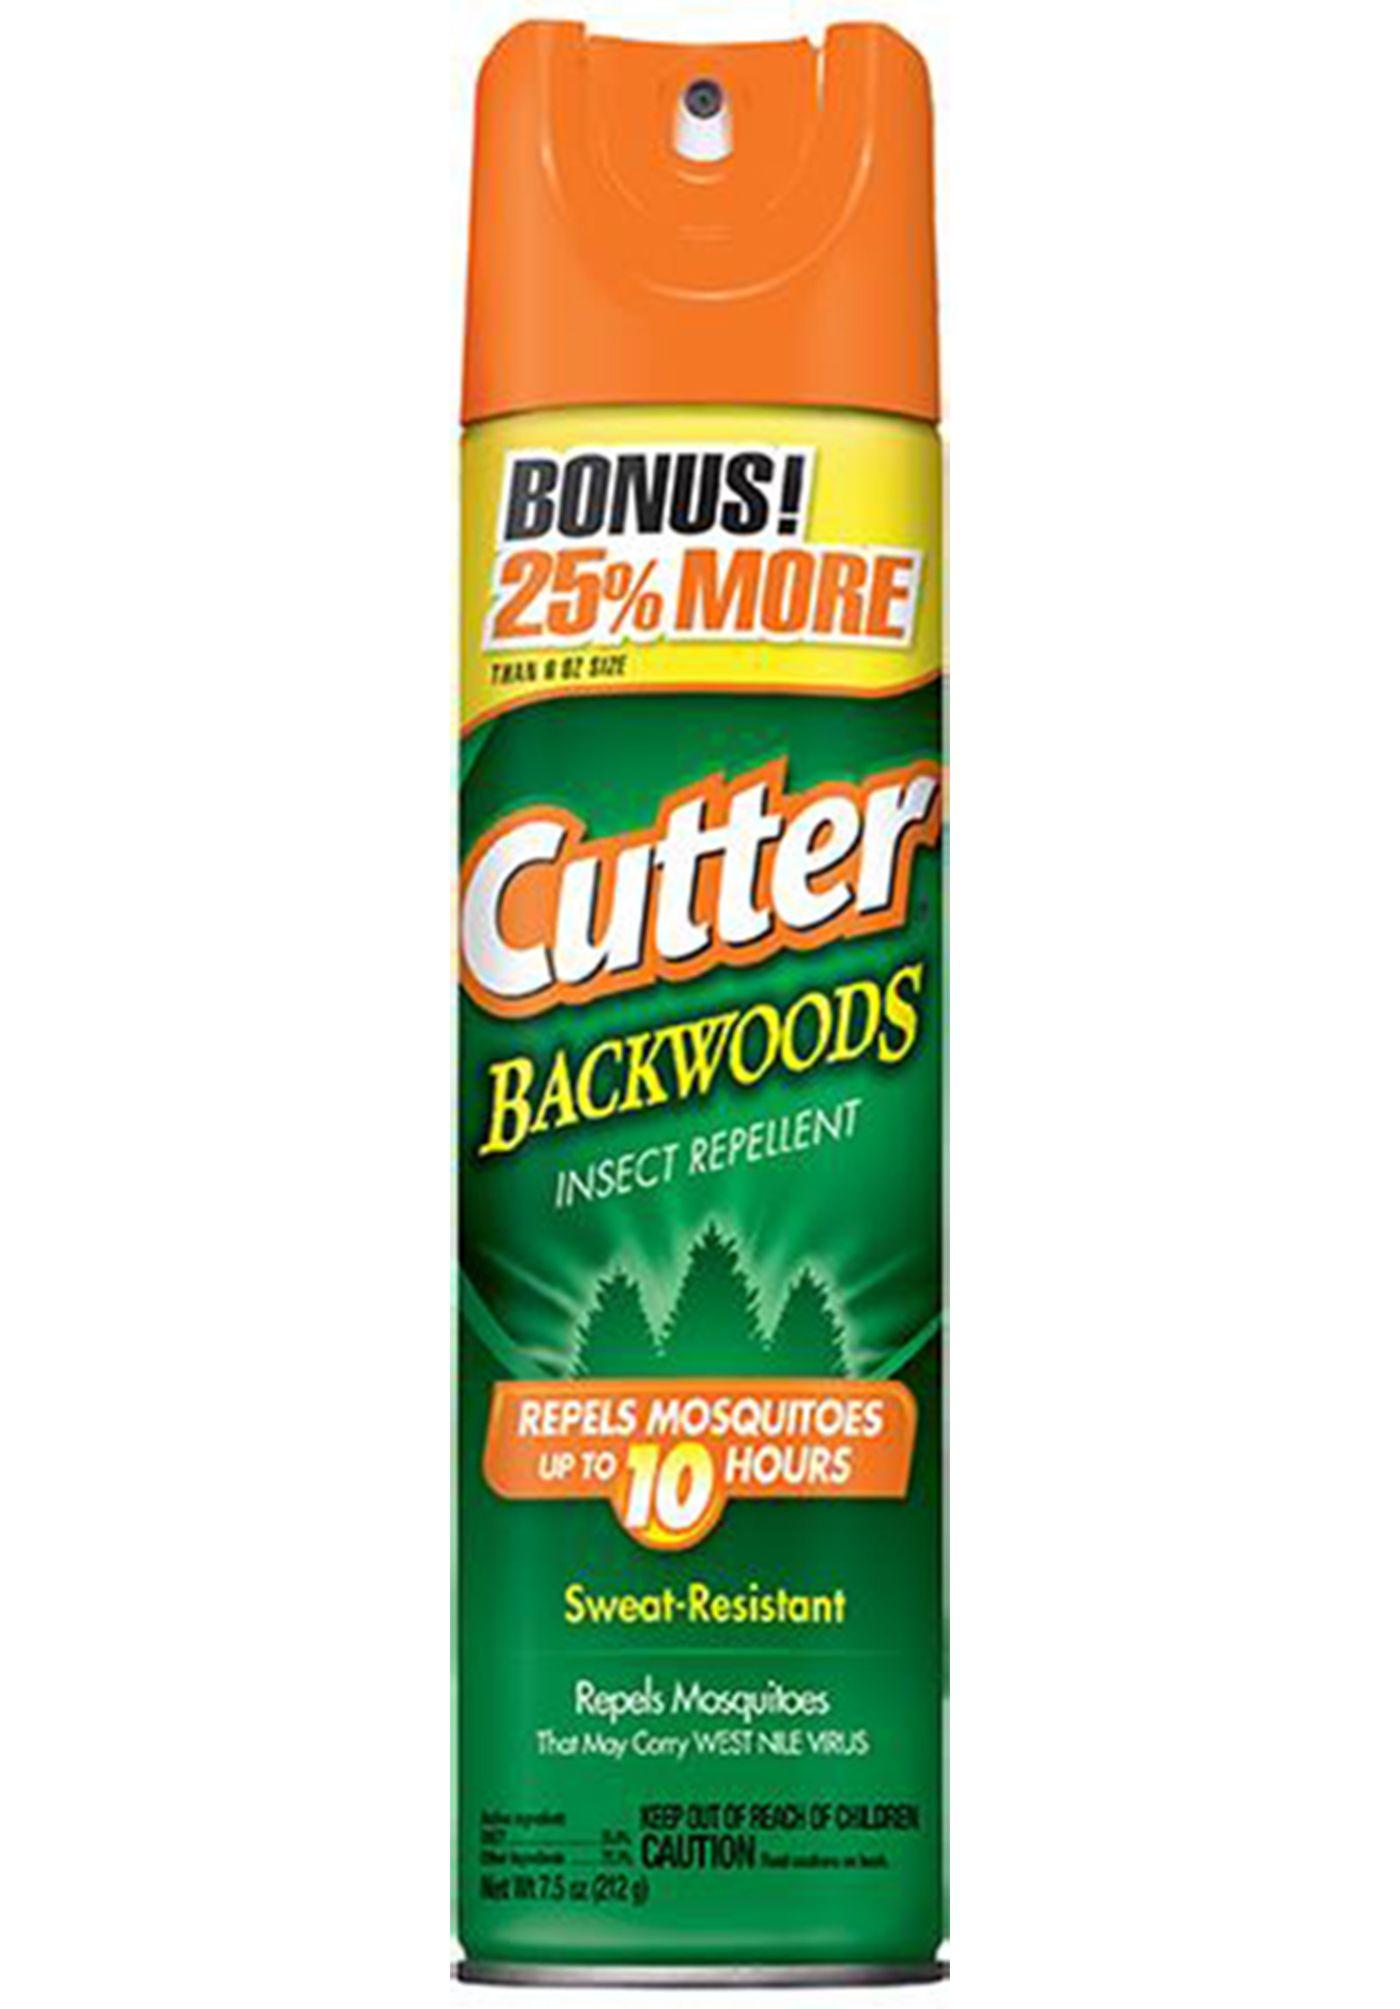 Cutter Backwoods 7.5 oz. Insect Repellent Aerosol